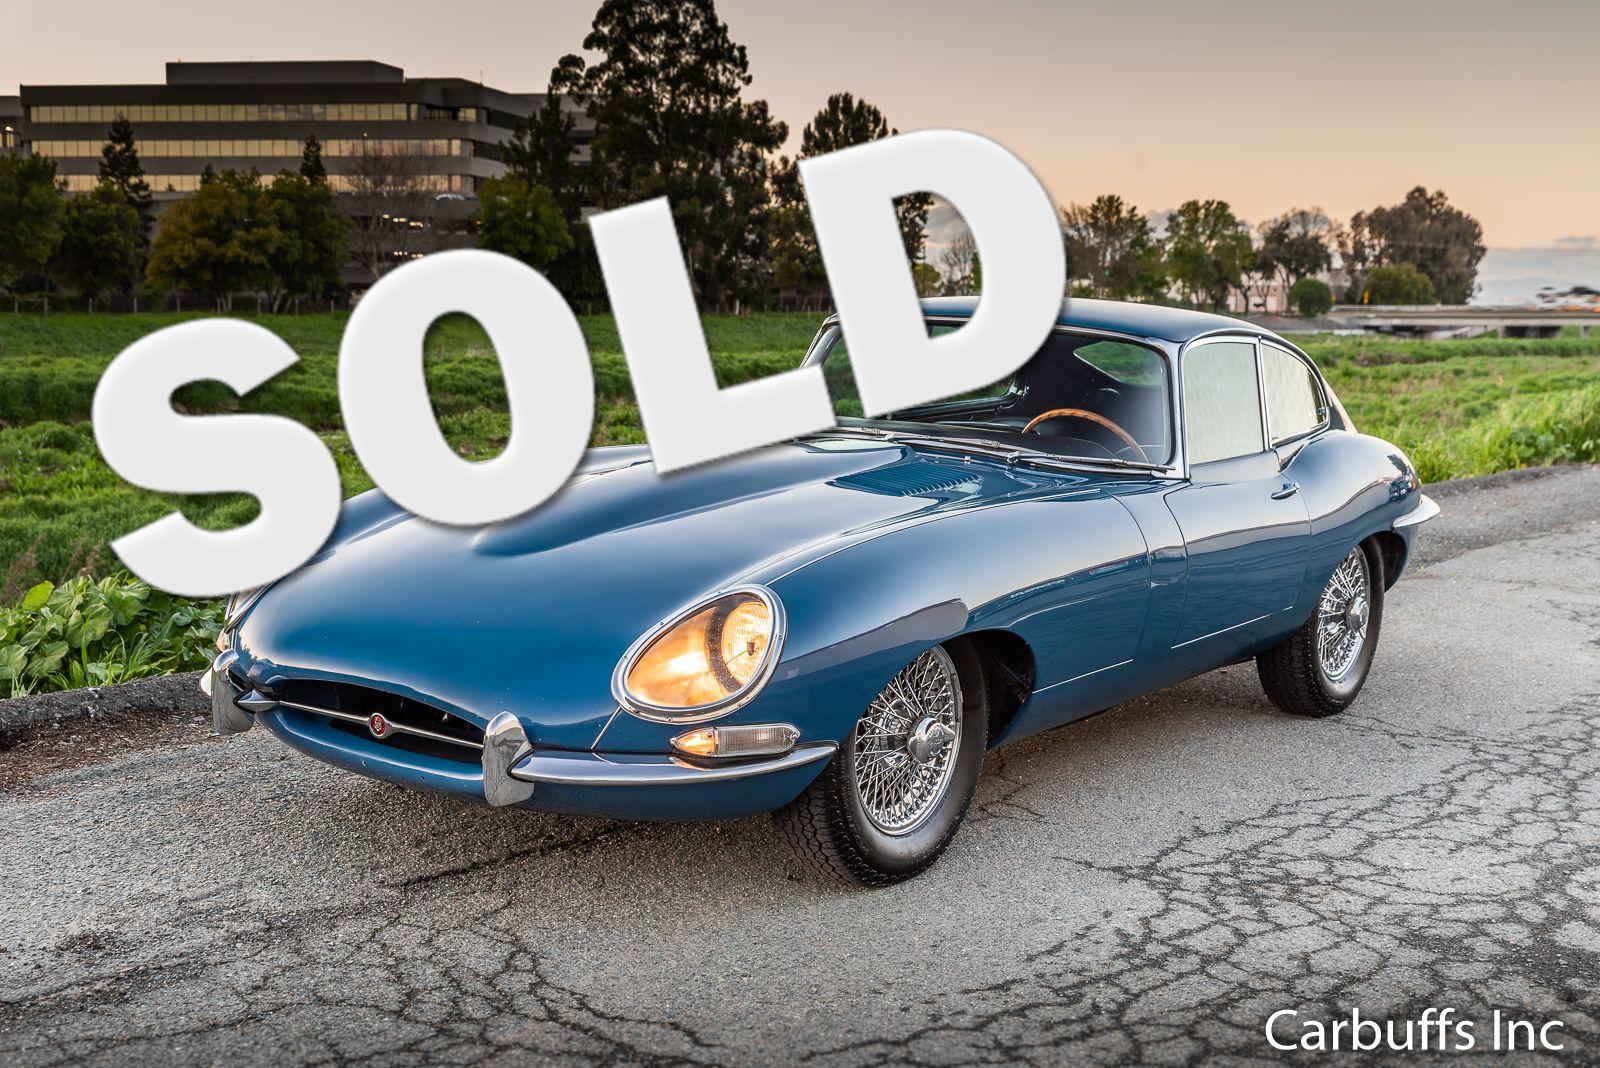 1966 jaguar xke series 1 concord ca carbuffs in concord ca  [ 1600 x 1068 Pixel ]